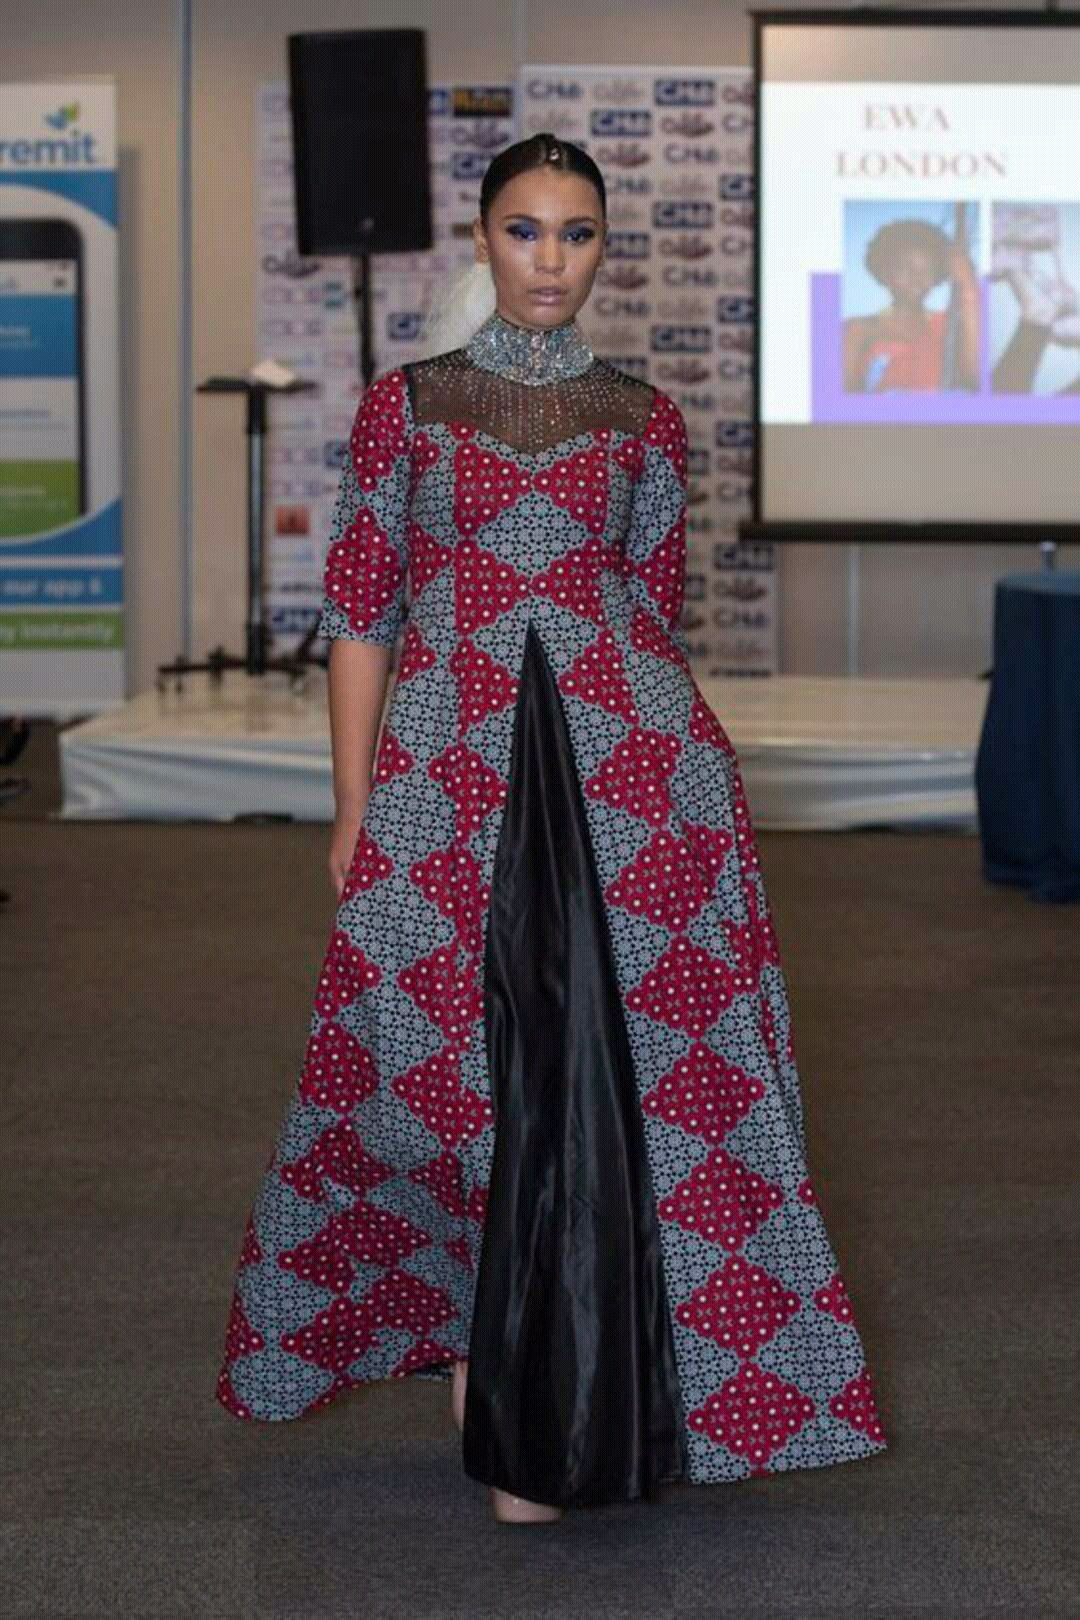 50 tenues en pagne pour hommes femmes et enfants african. Black Bedroom Furniture Sets. Home Design Ideas